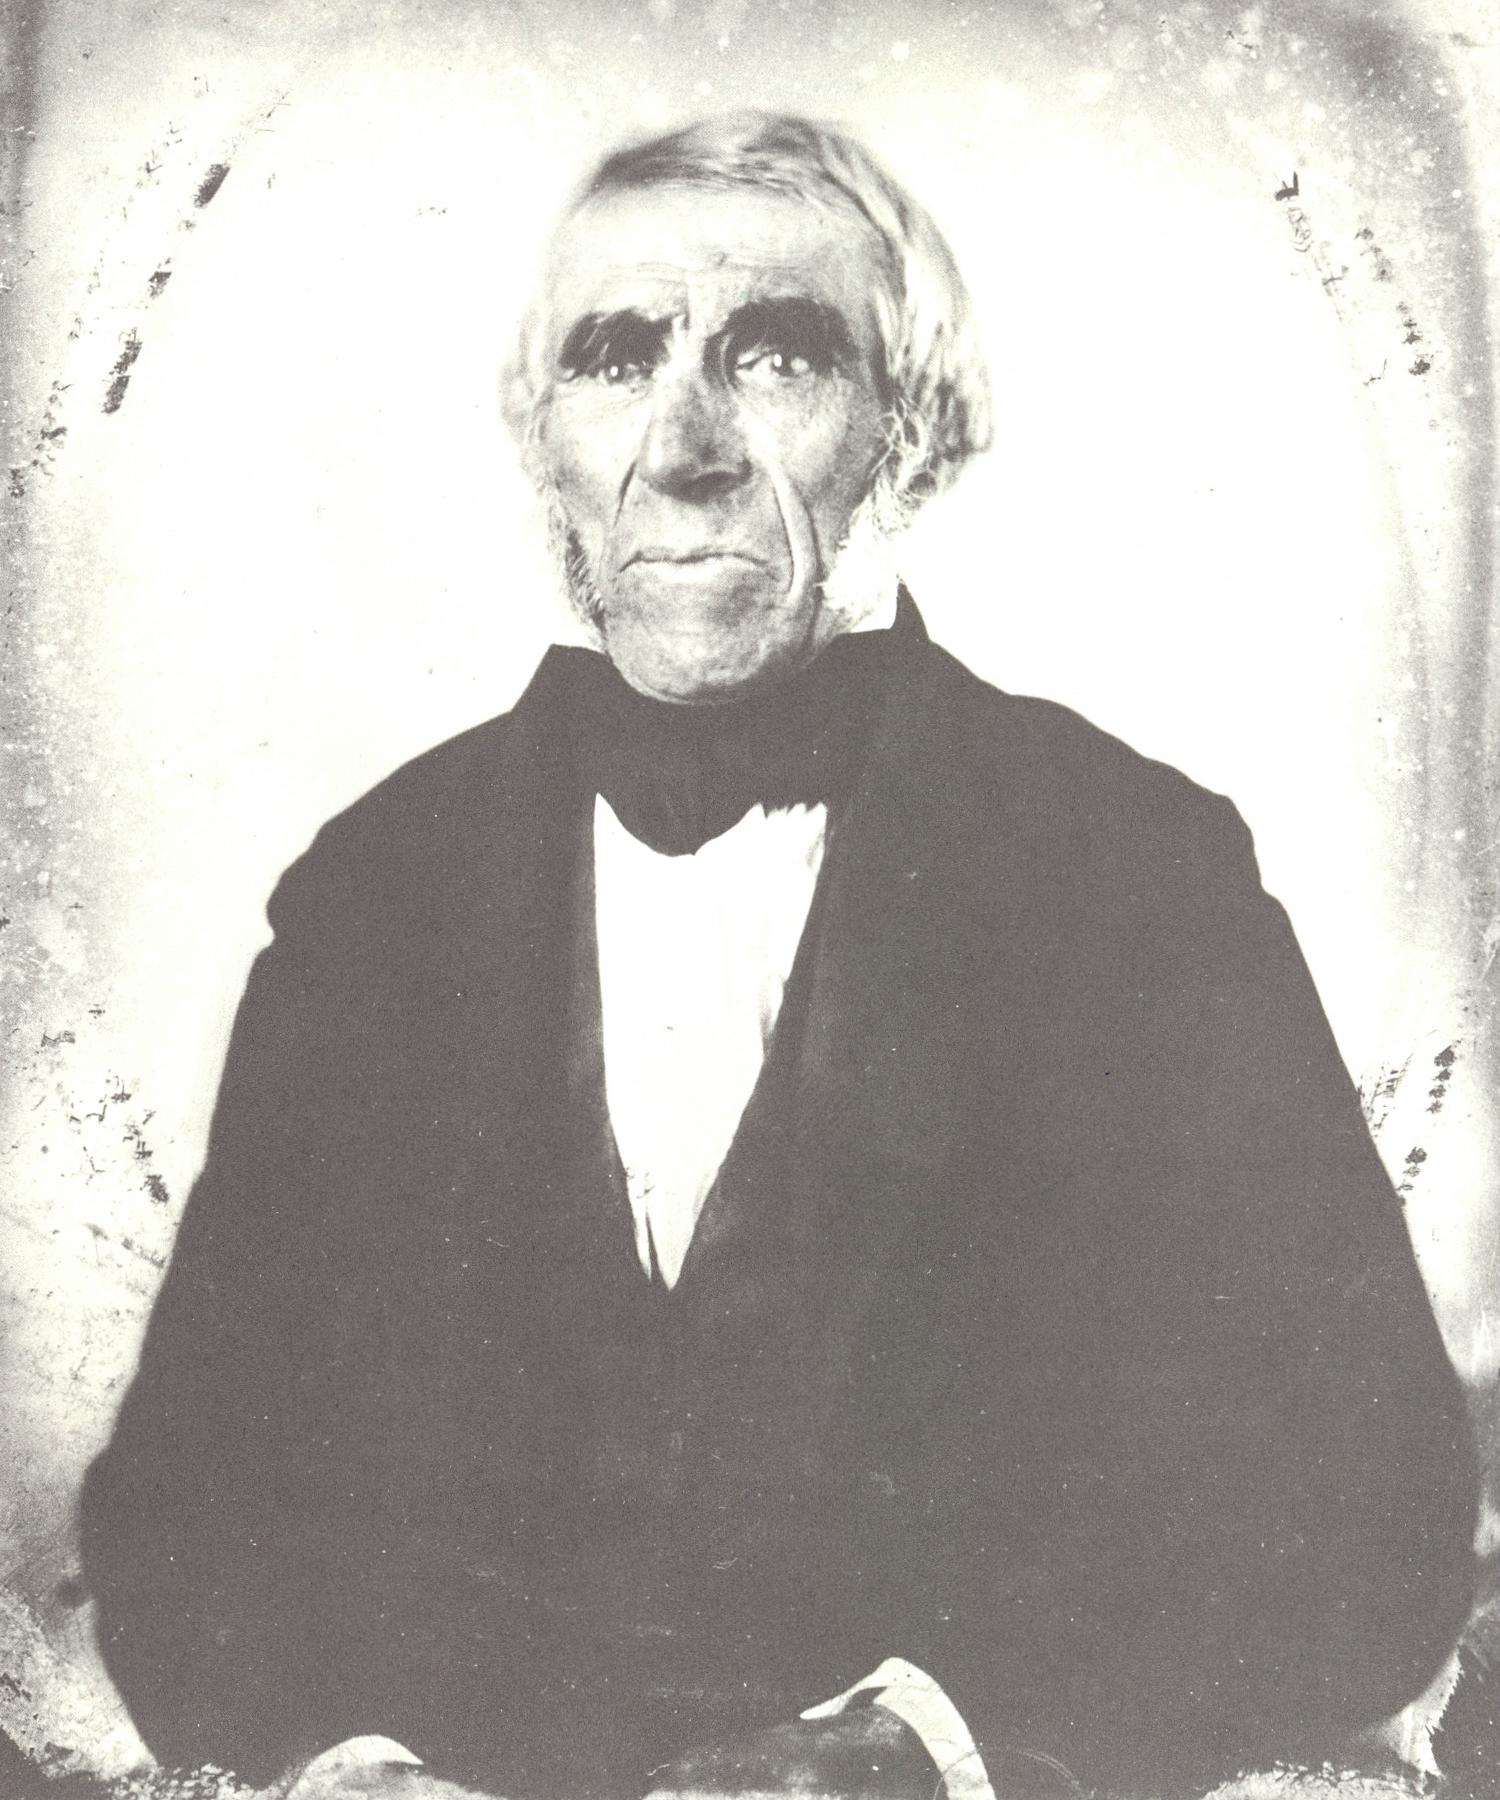 Peter Rindisbacher